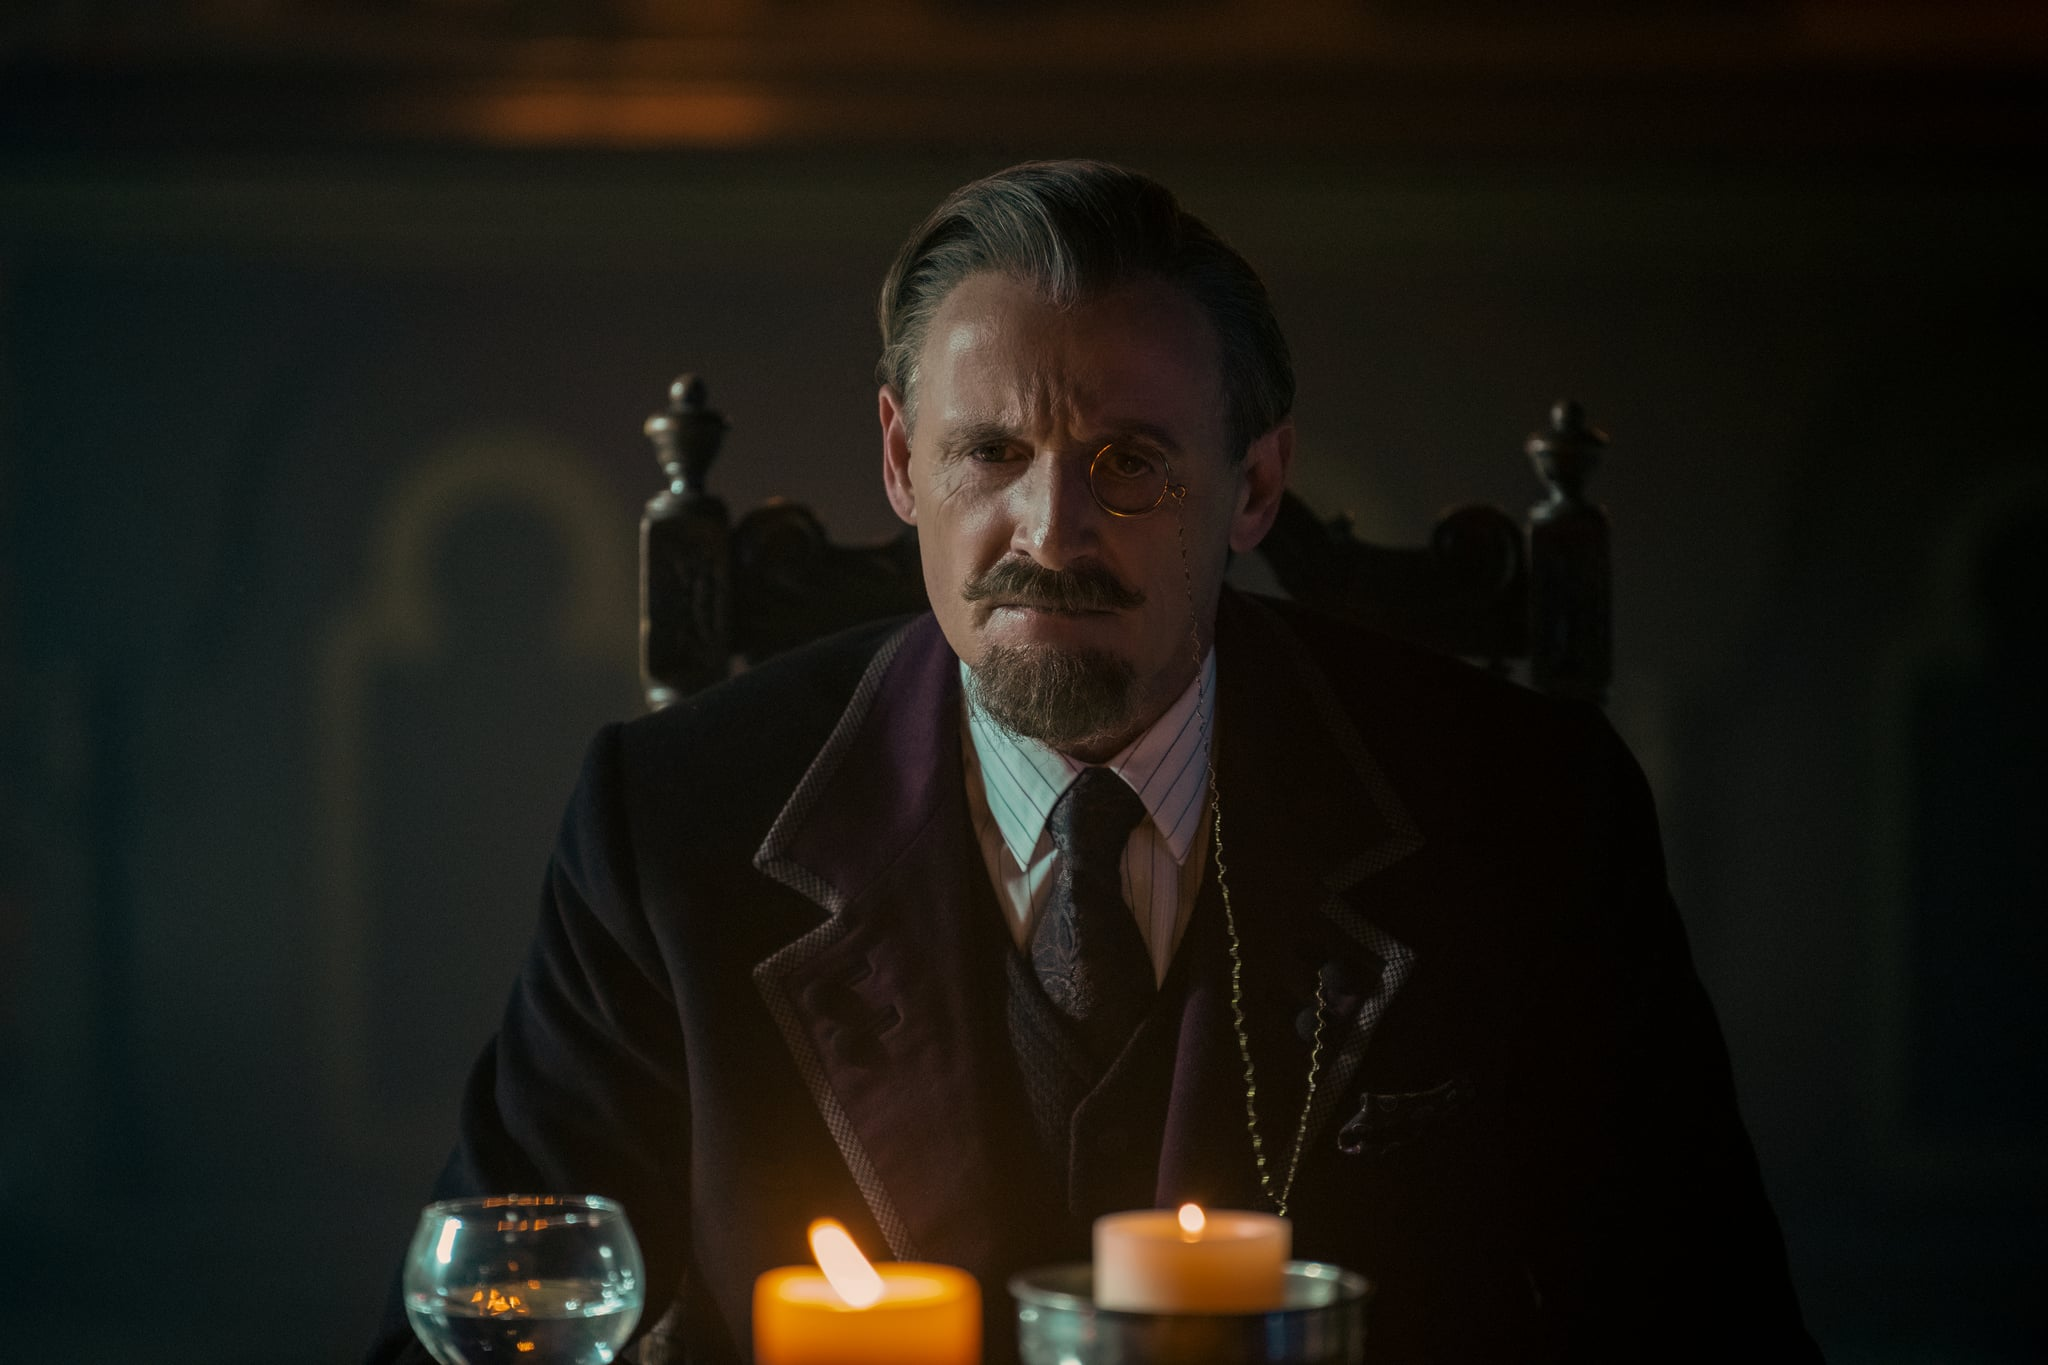 THE UMBRELLA ACADEMY COLM FEORE as SIR REGINALD HARGREEVES in episode 208 of THE UMBRELLA ACADEMY Cr. CHRISTOS KALOHORIDIS/NETFLIX  2020